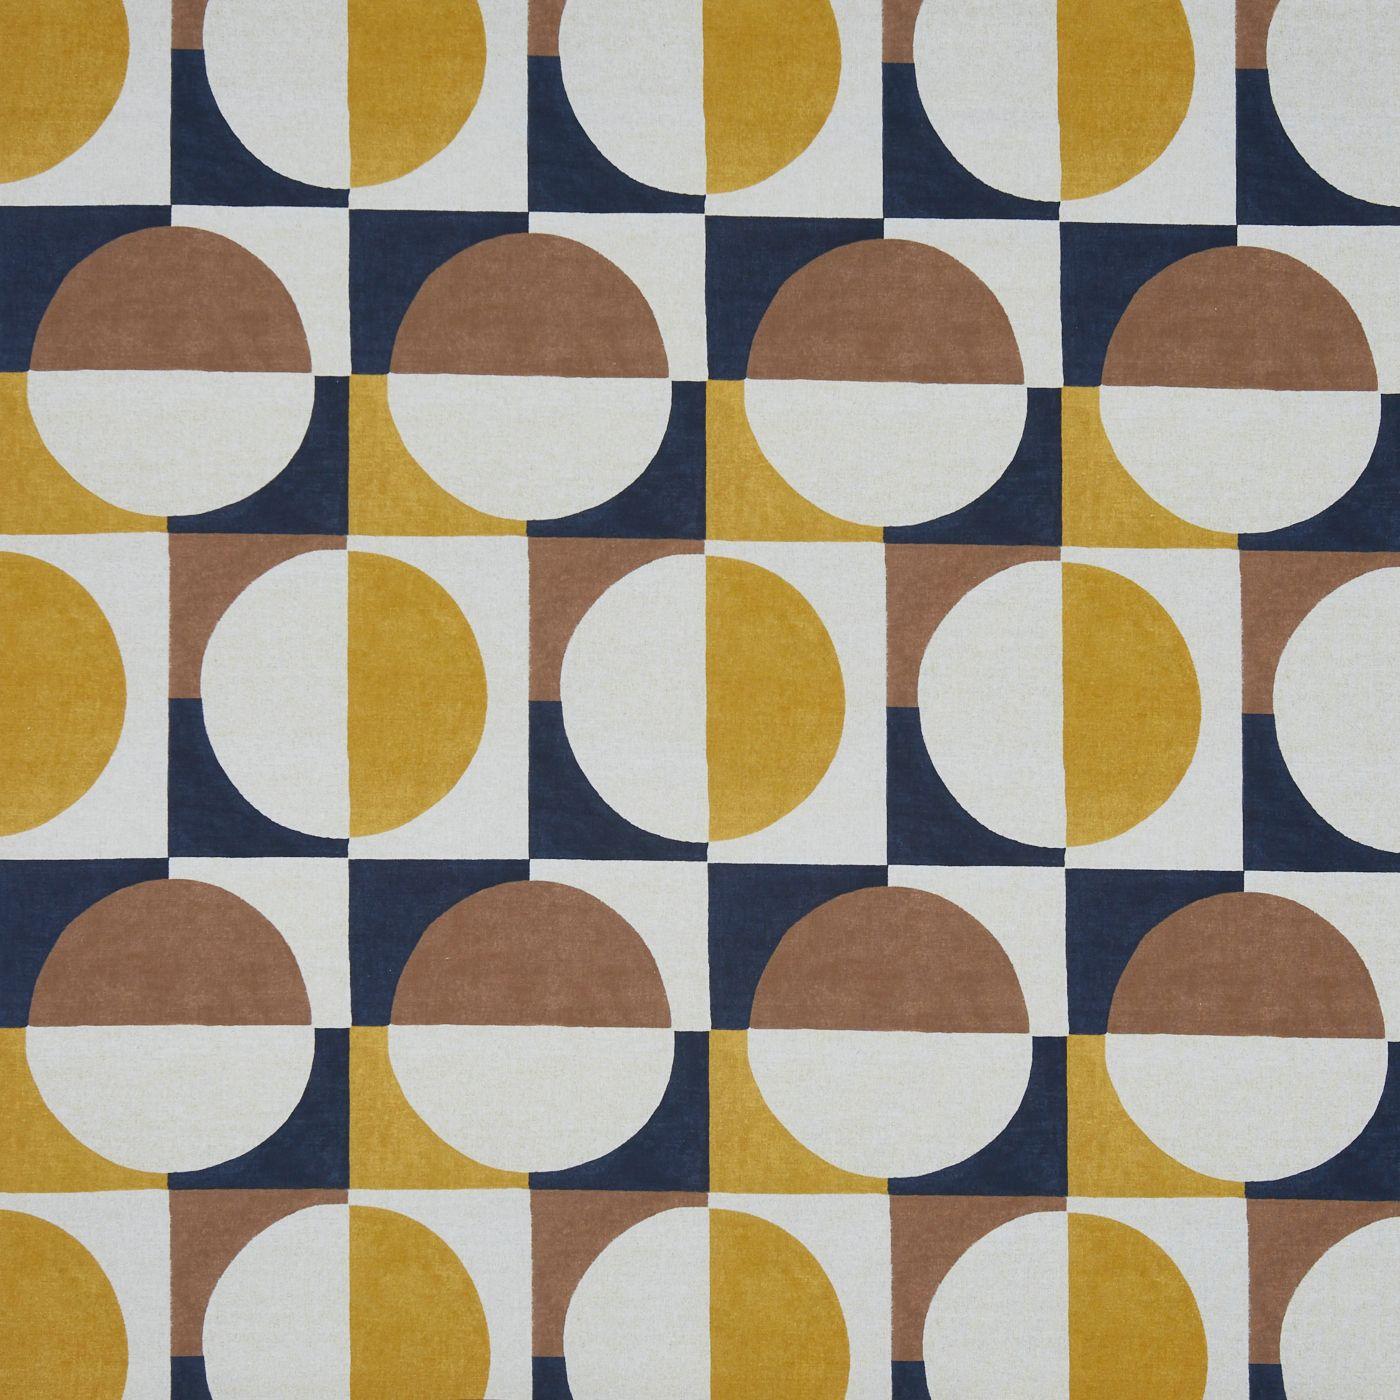 Arc Bumble Fabric Abstract Prestigious Textiles In 2020 Prestigious Textiles Fabric Fabric Roller Blinds